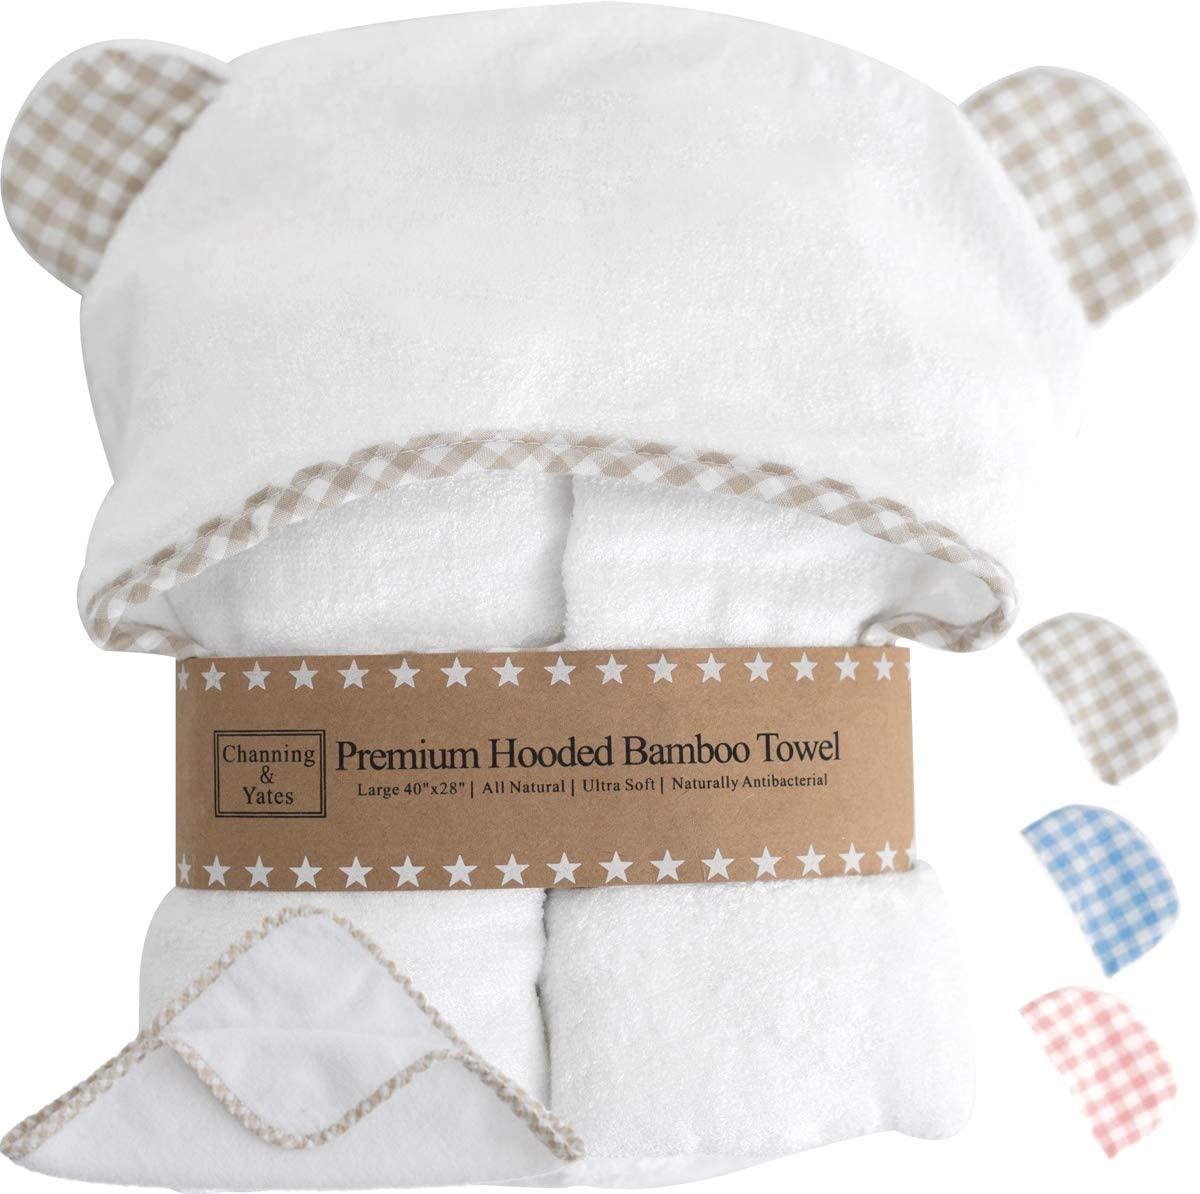 Channing & Yates Hooded Bamboo Baby Bath Towel